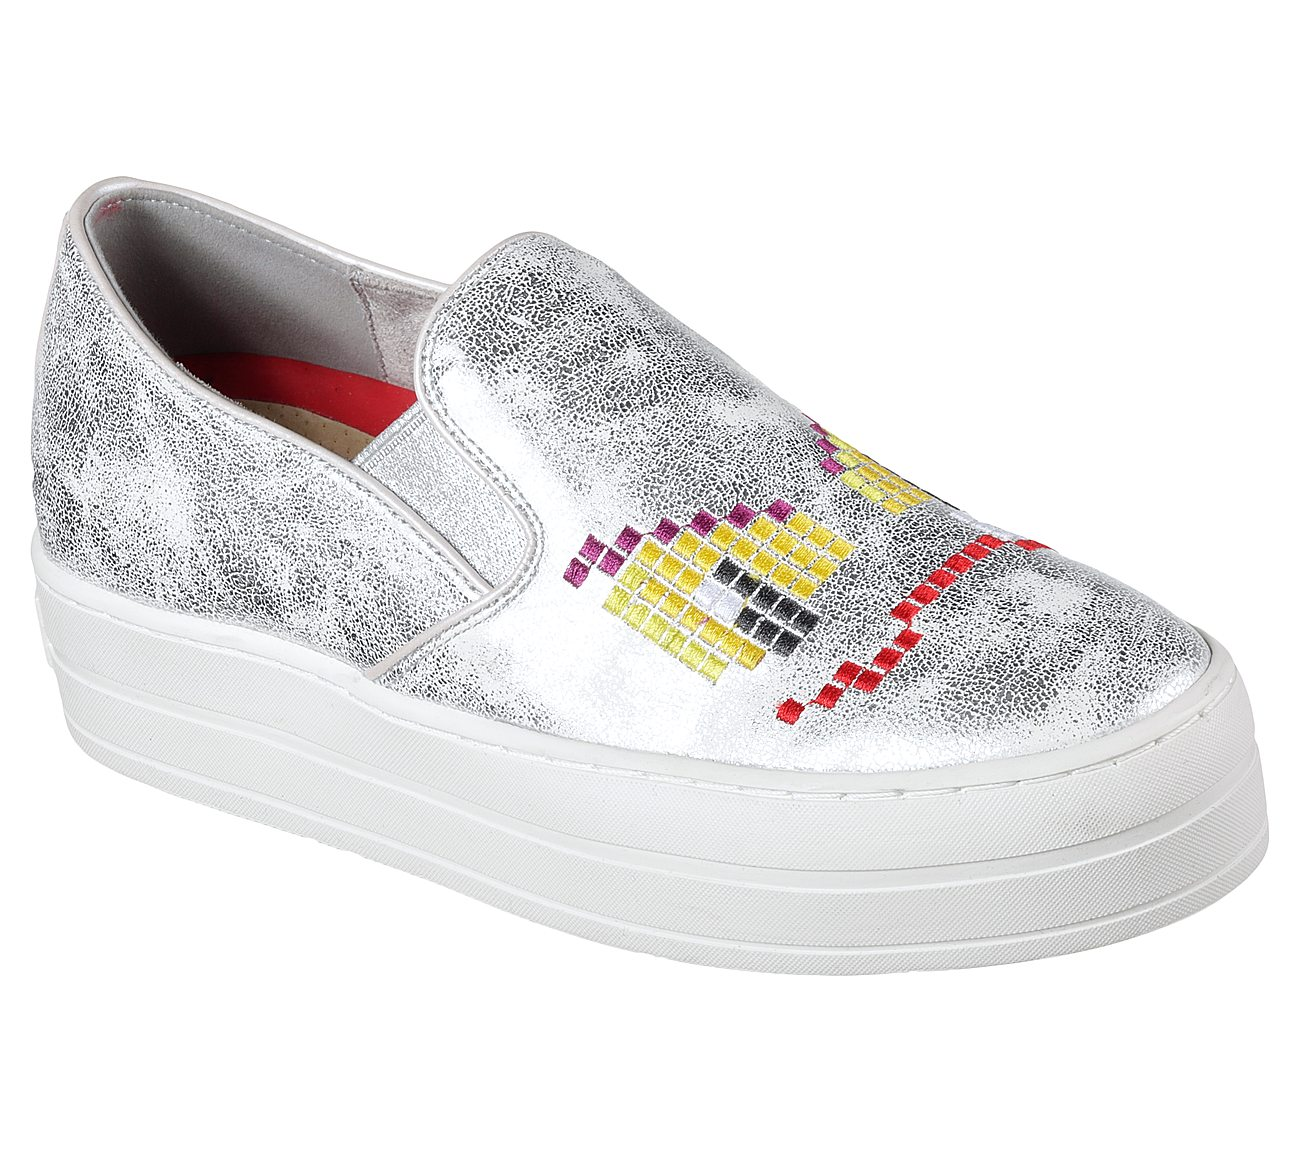 SKECHER 00 Street Shoes Uplift only Grimace 40 Buy SKECHERS xqwpPWt